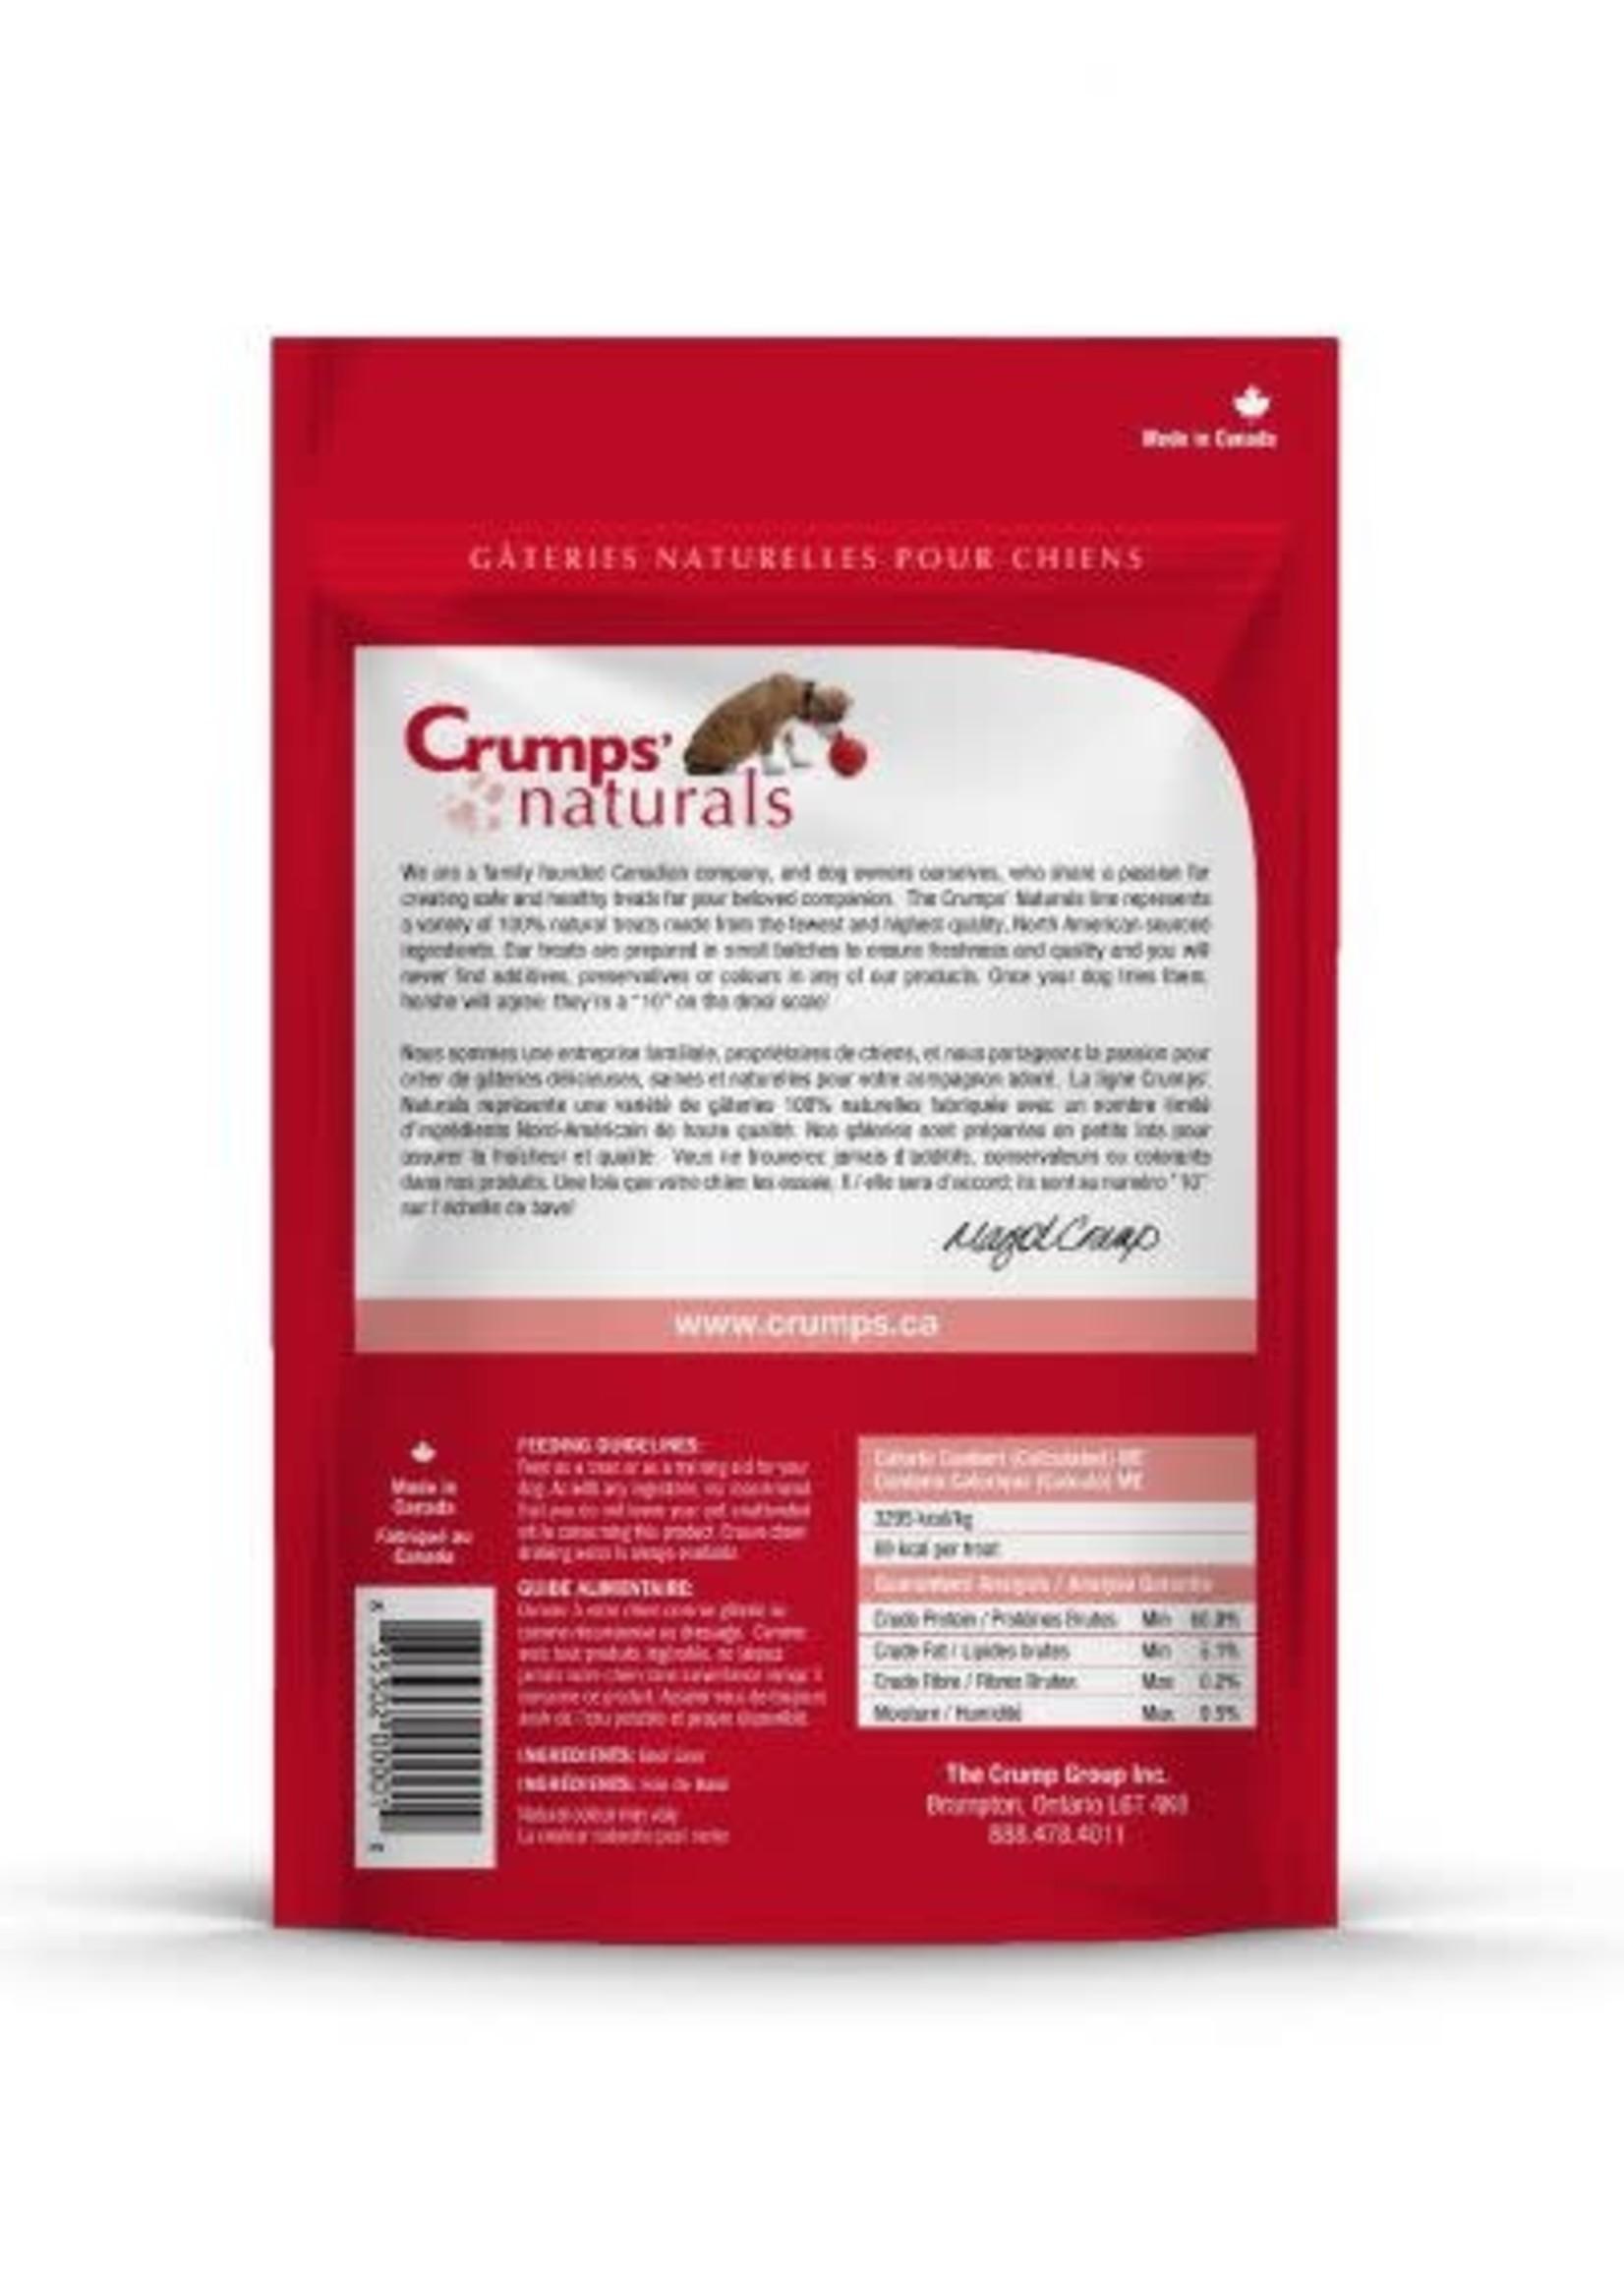 Crumps Traditional Liver Fillets 2.4oz